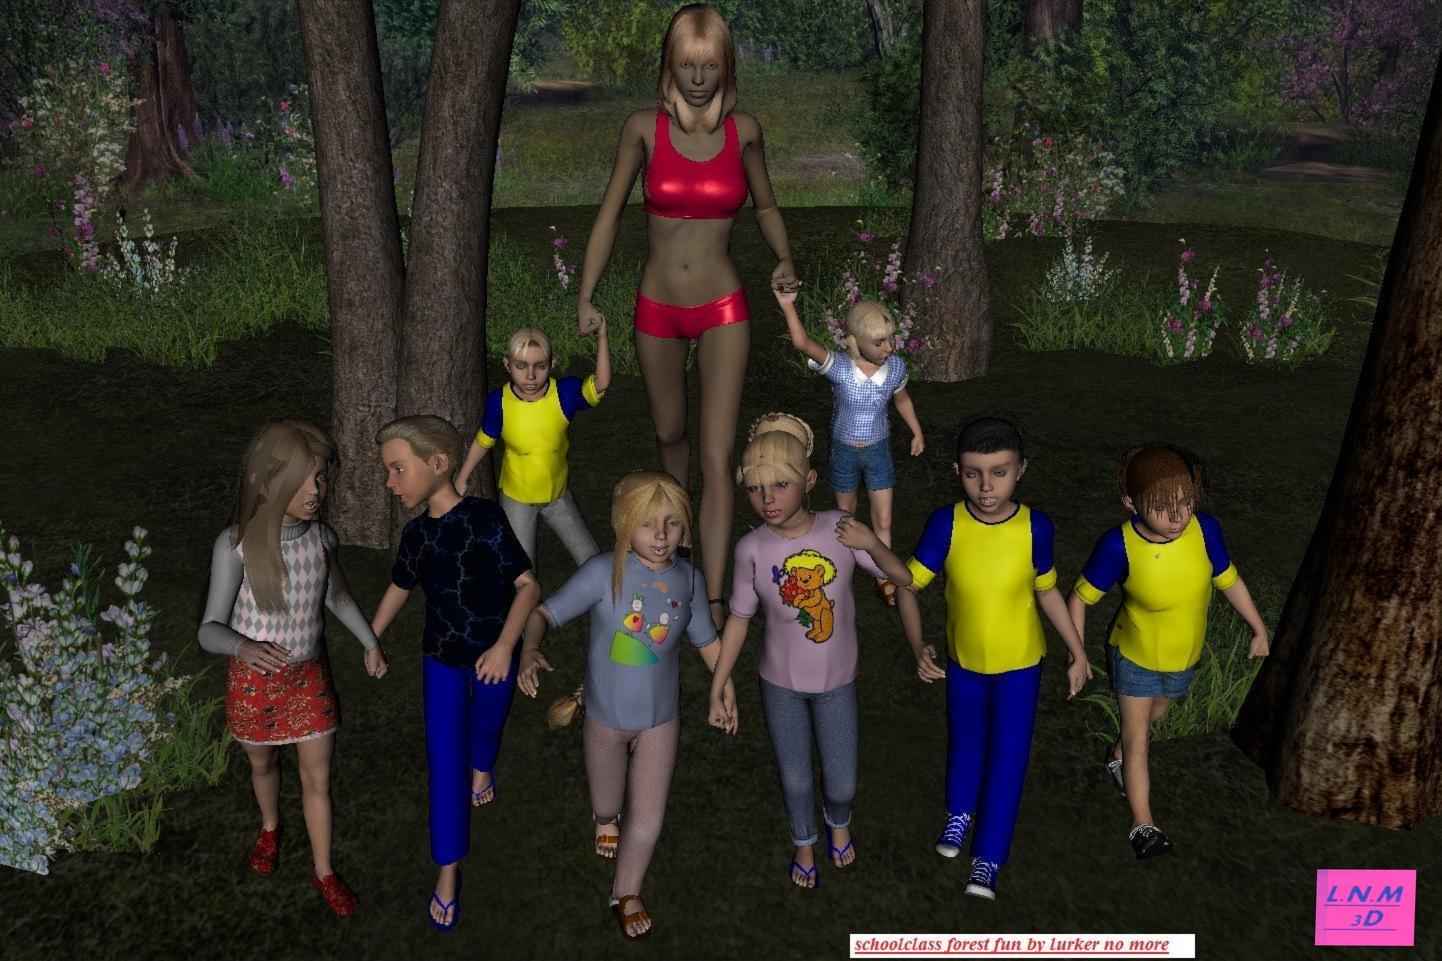 Girls gone wild orgy torrent